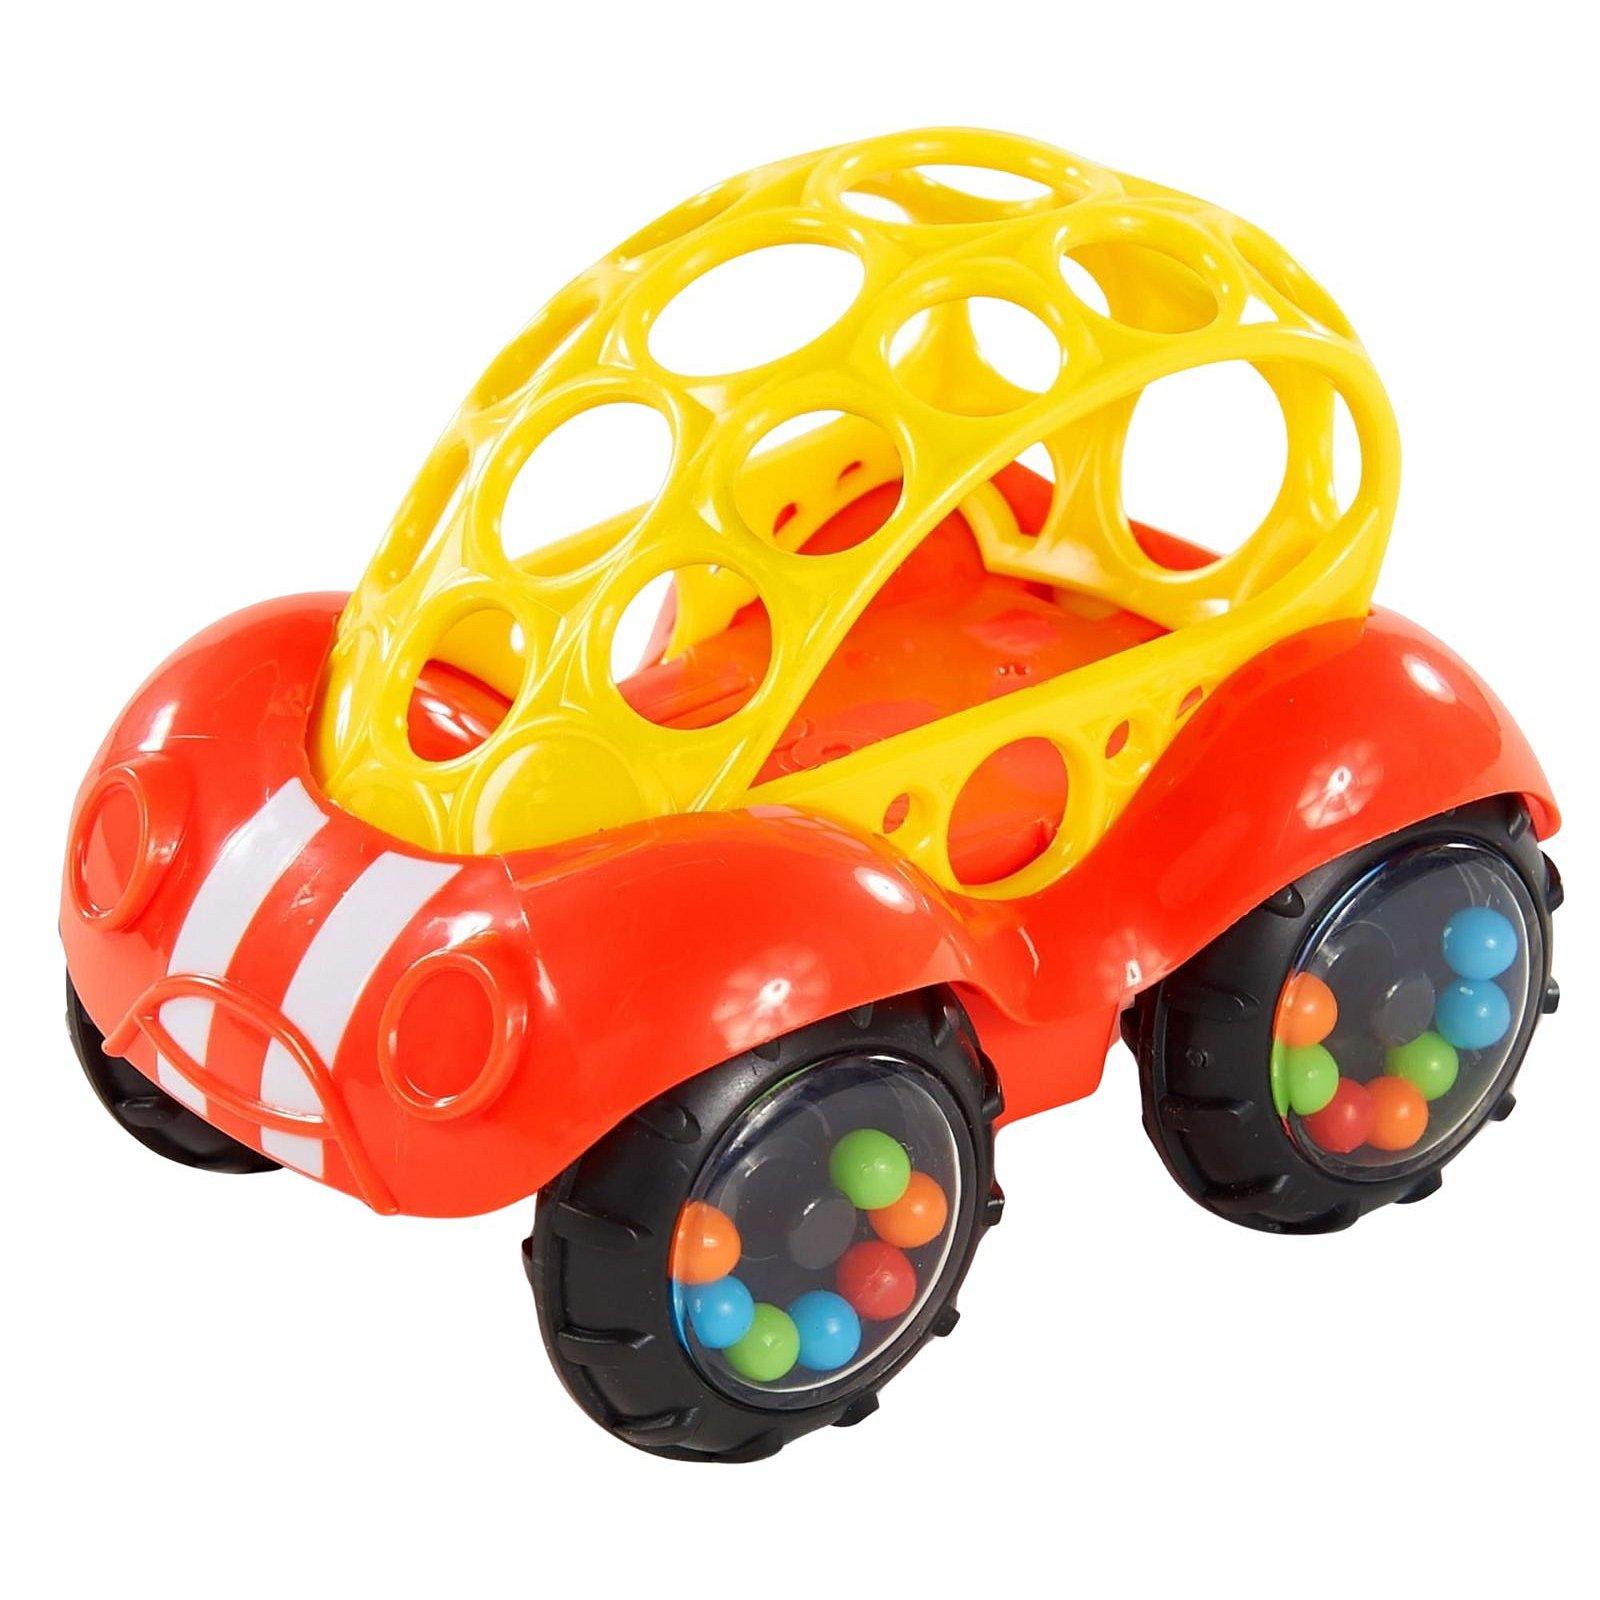 OBALL Hračka autíčko Rattle & Roll Oball™ červeno / žluté 3m+